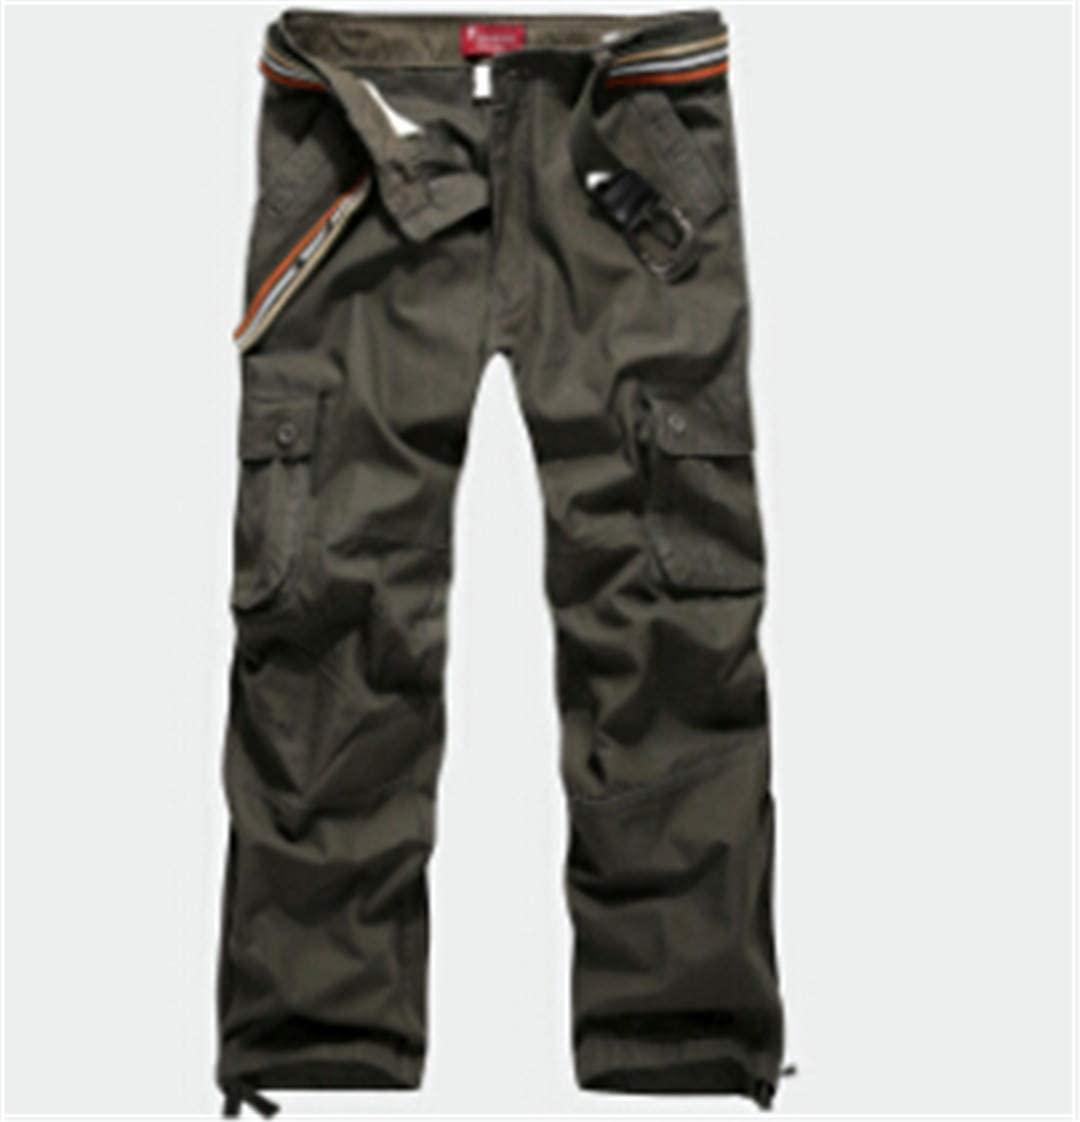 PUNKDBOTTO Plus Size Men's Cargo Pants Casual Multi Pocket Cargos Trousers Long Pant